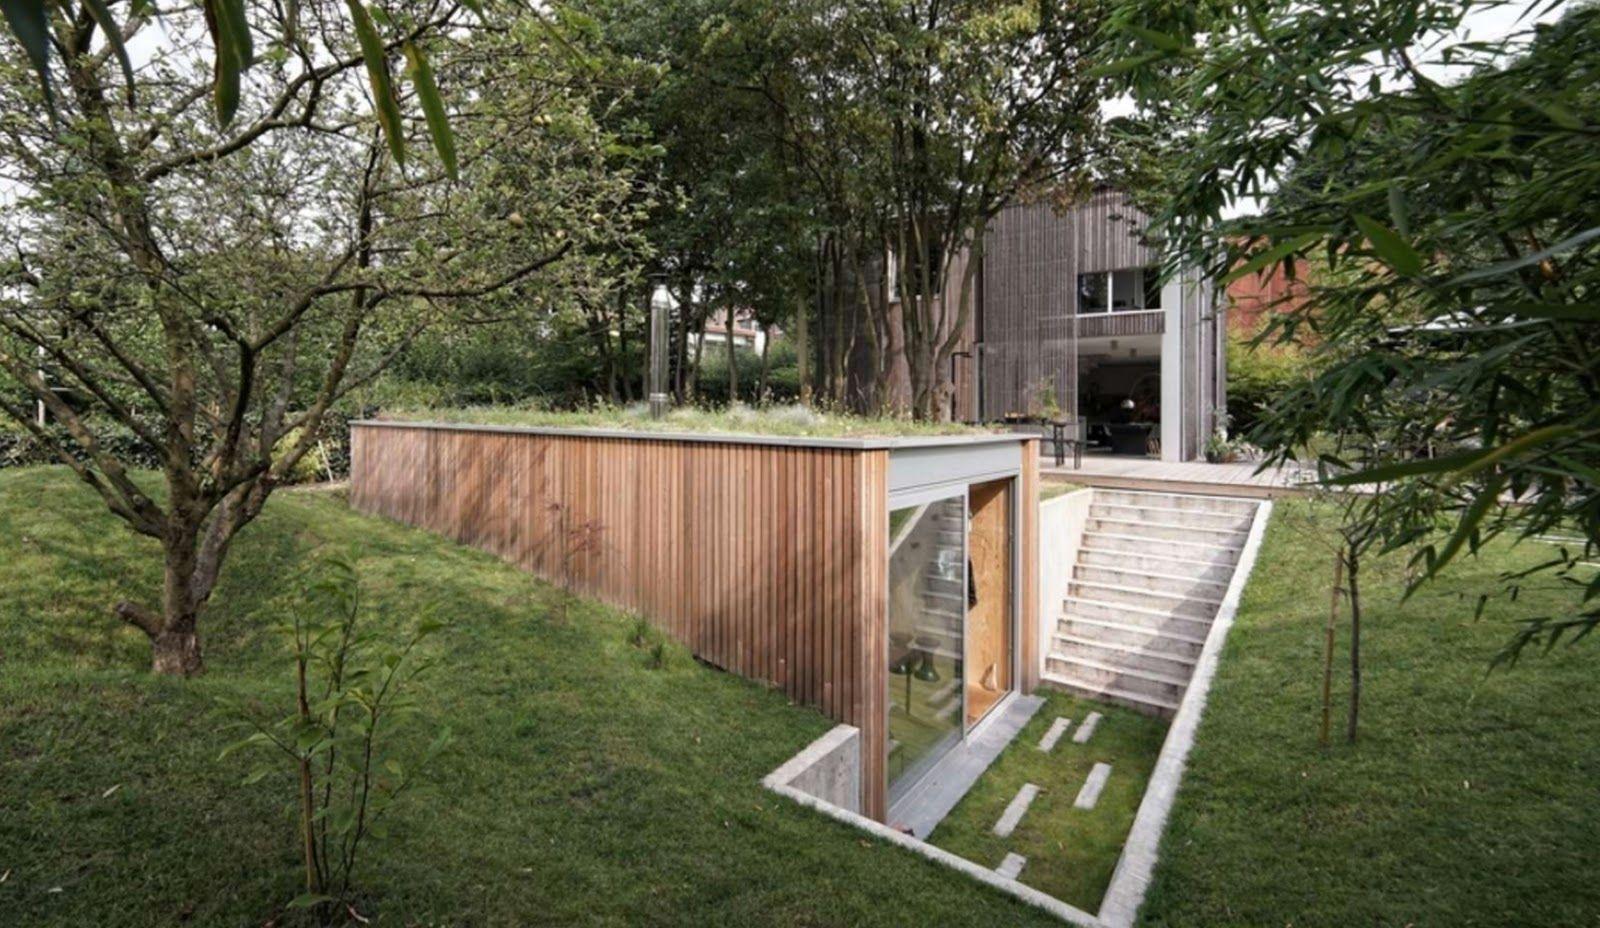 Design Your Own Earthbag Home Underground Garden Office Atelier Pam Amp Jenny House Ideas